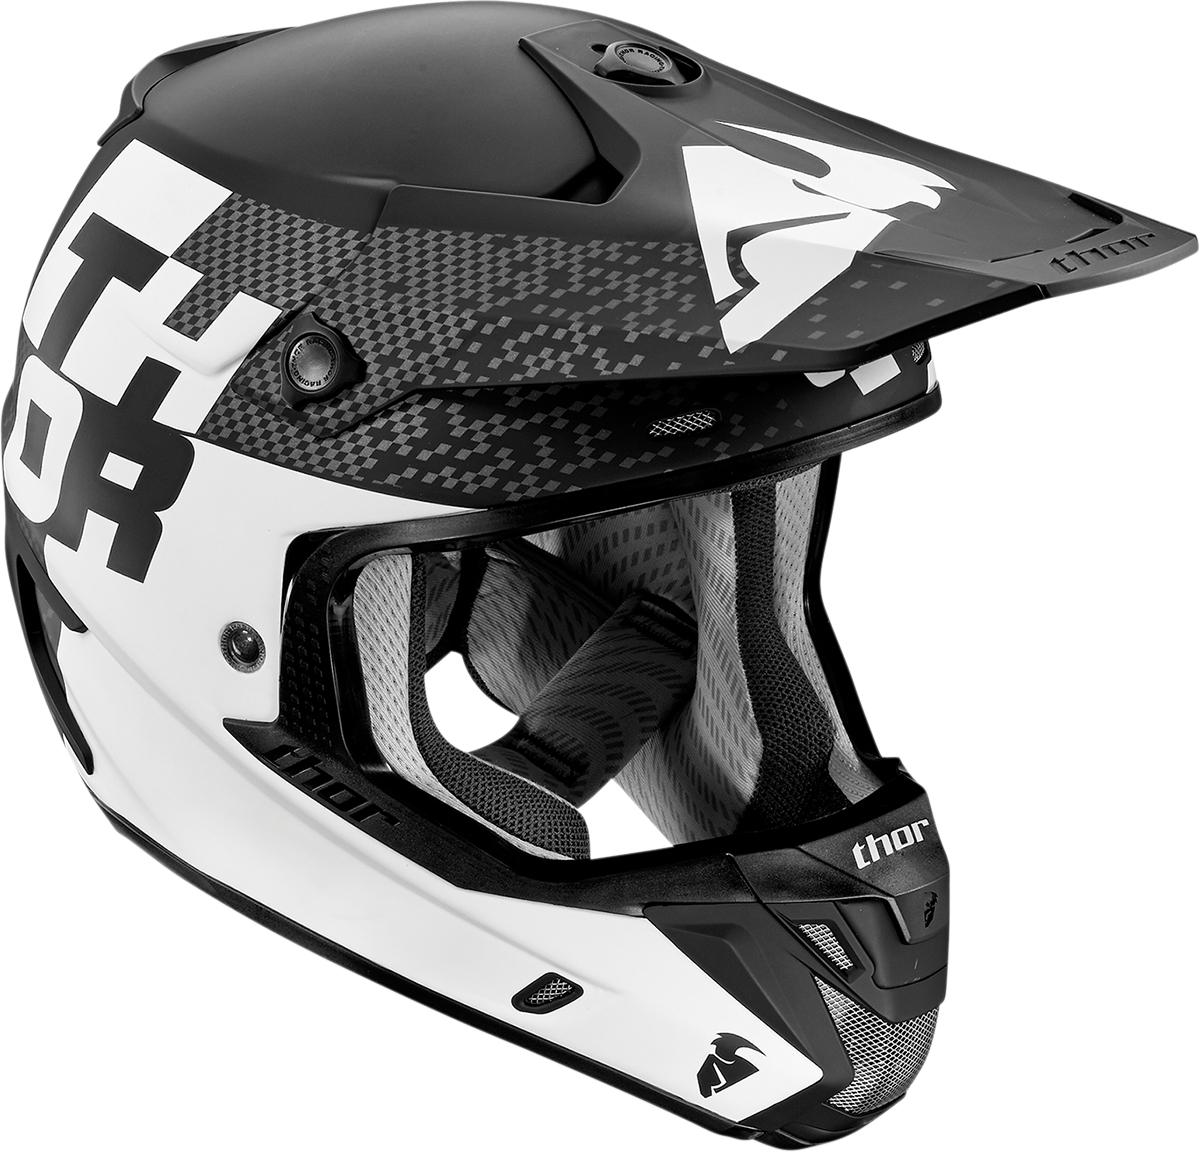 Thor S6 Verge Tach Helmet